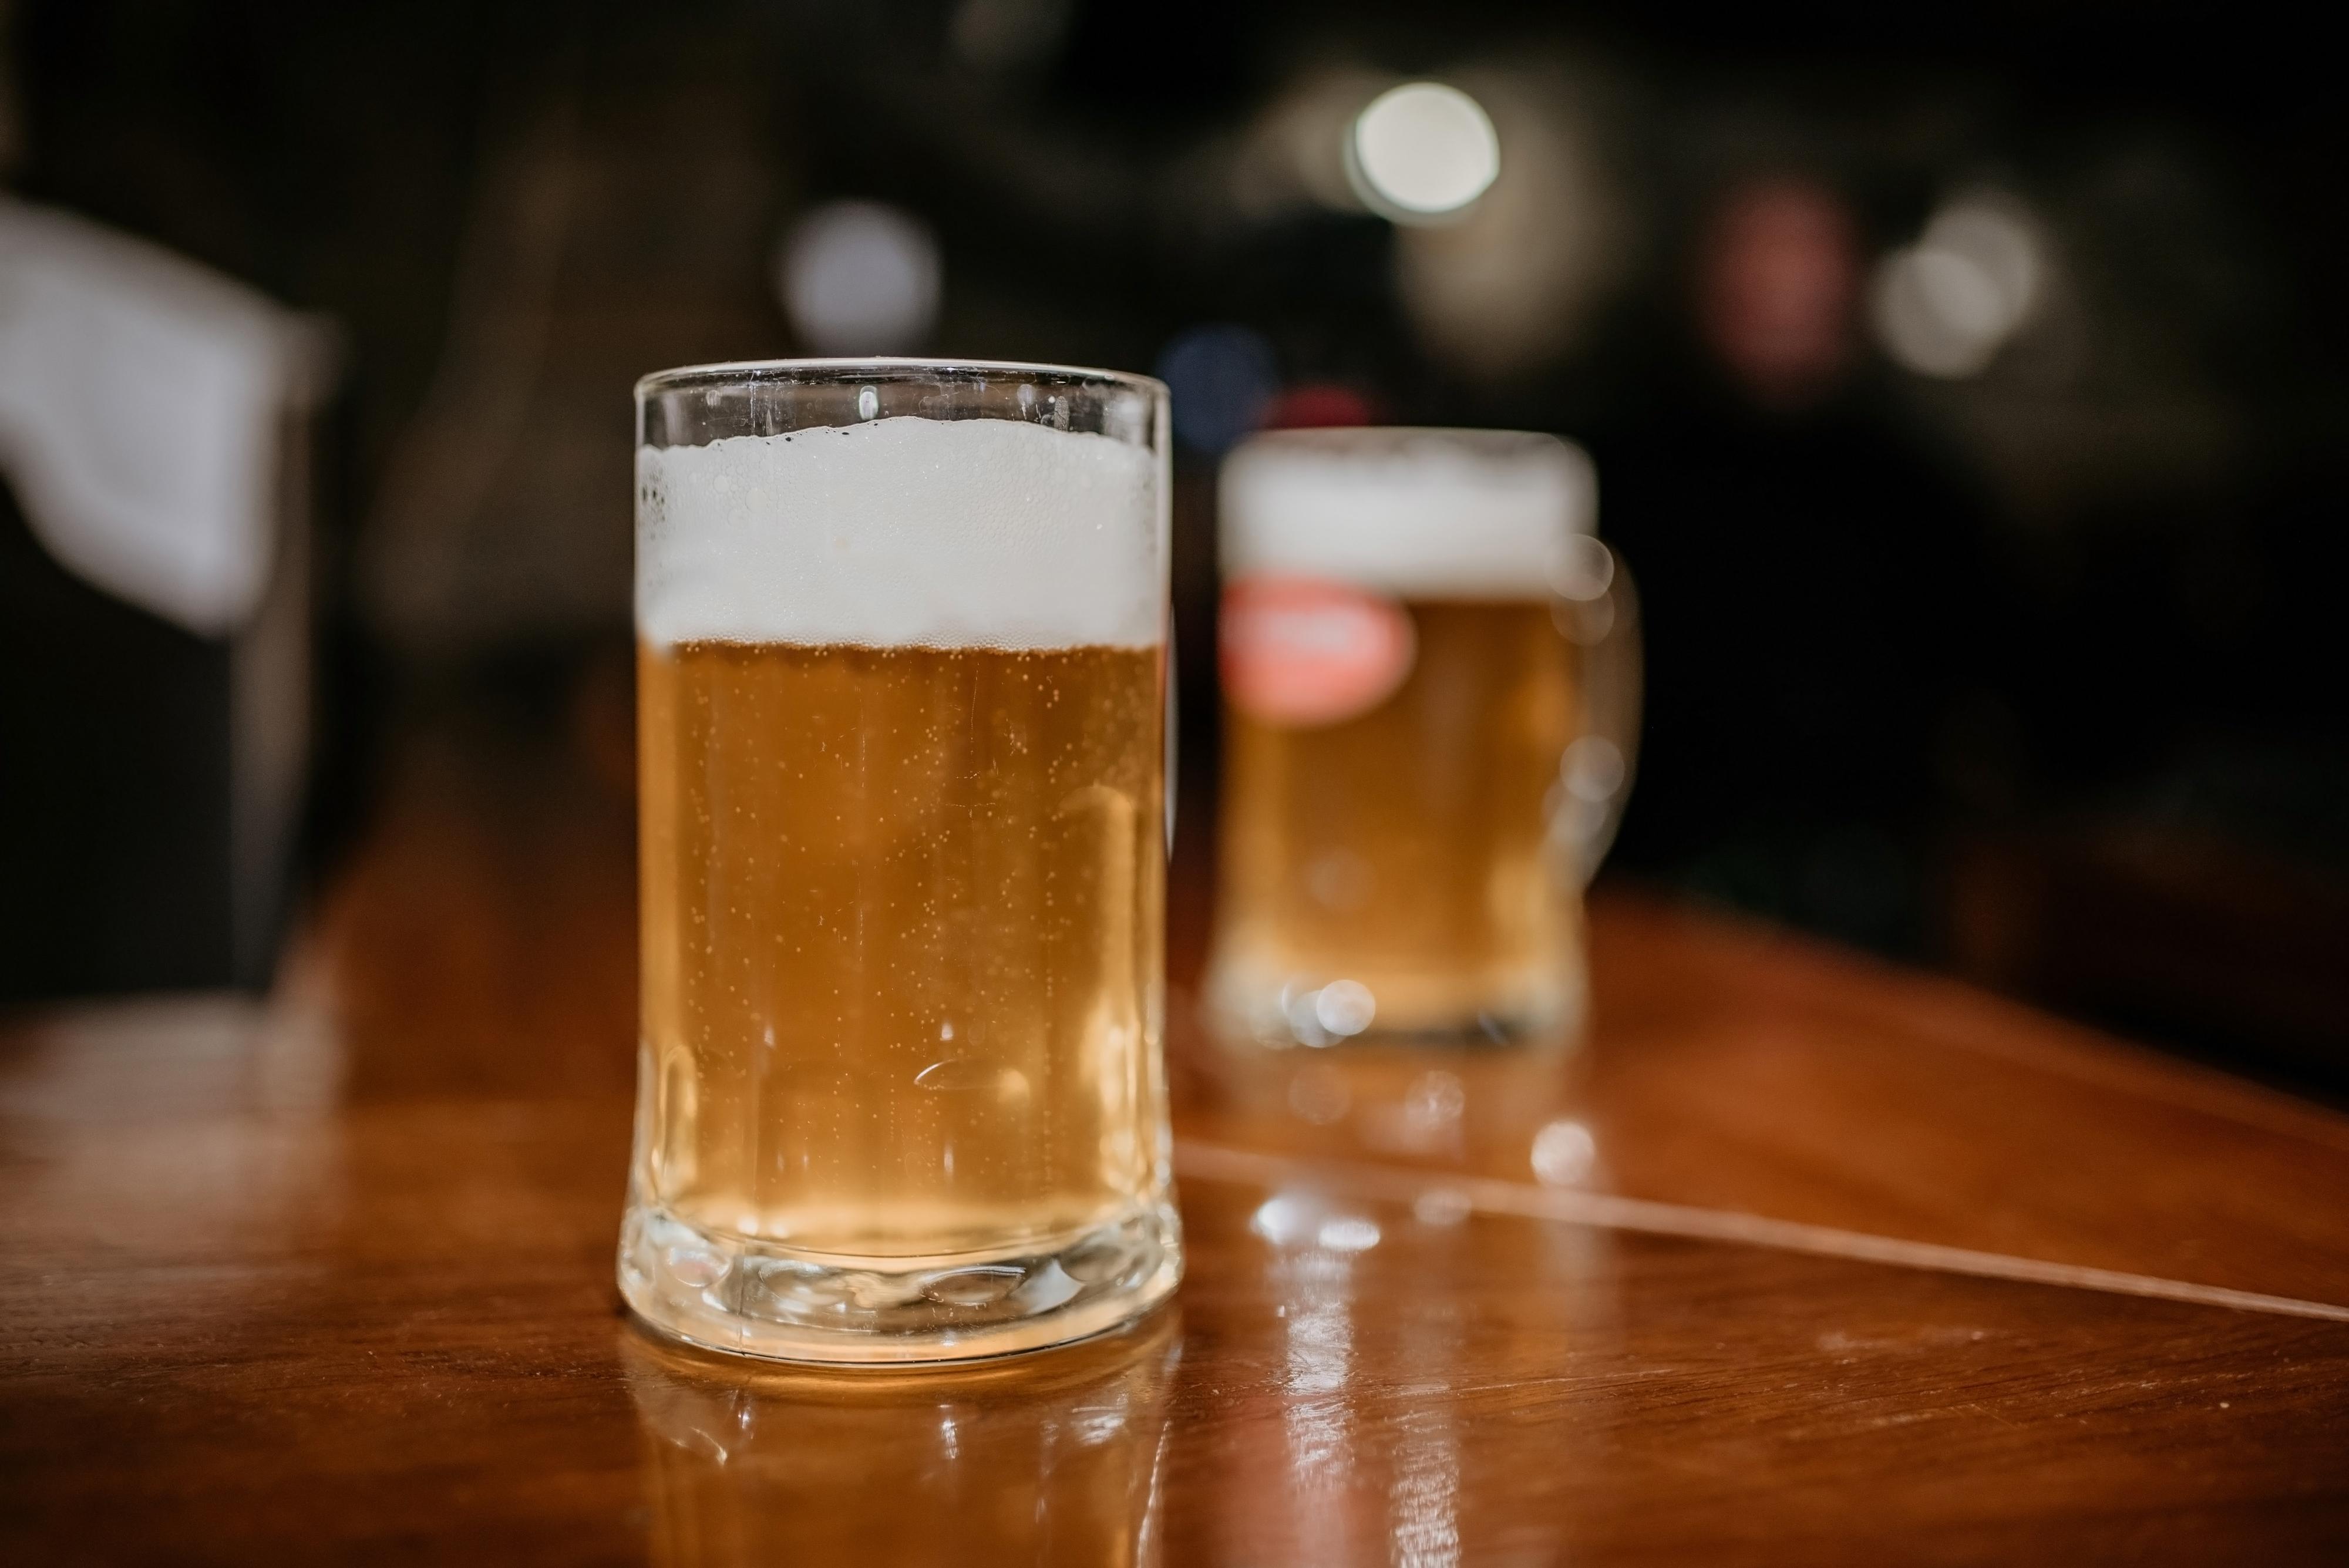 A mug of beer on a wooden bar